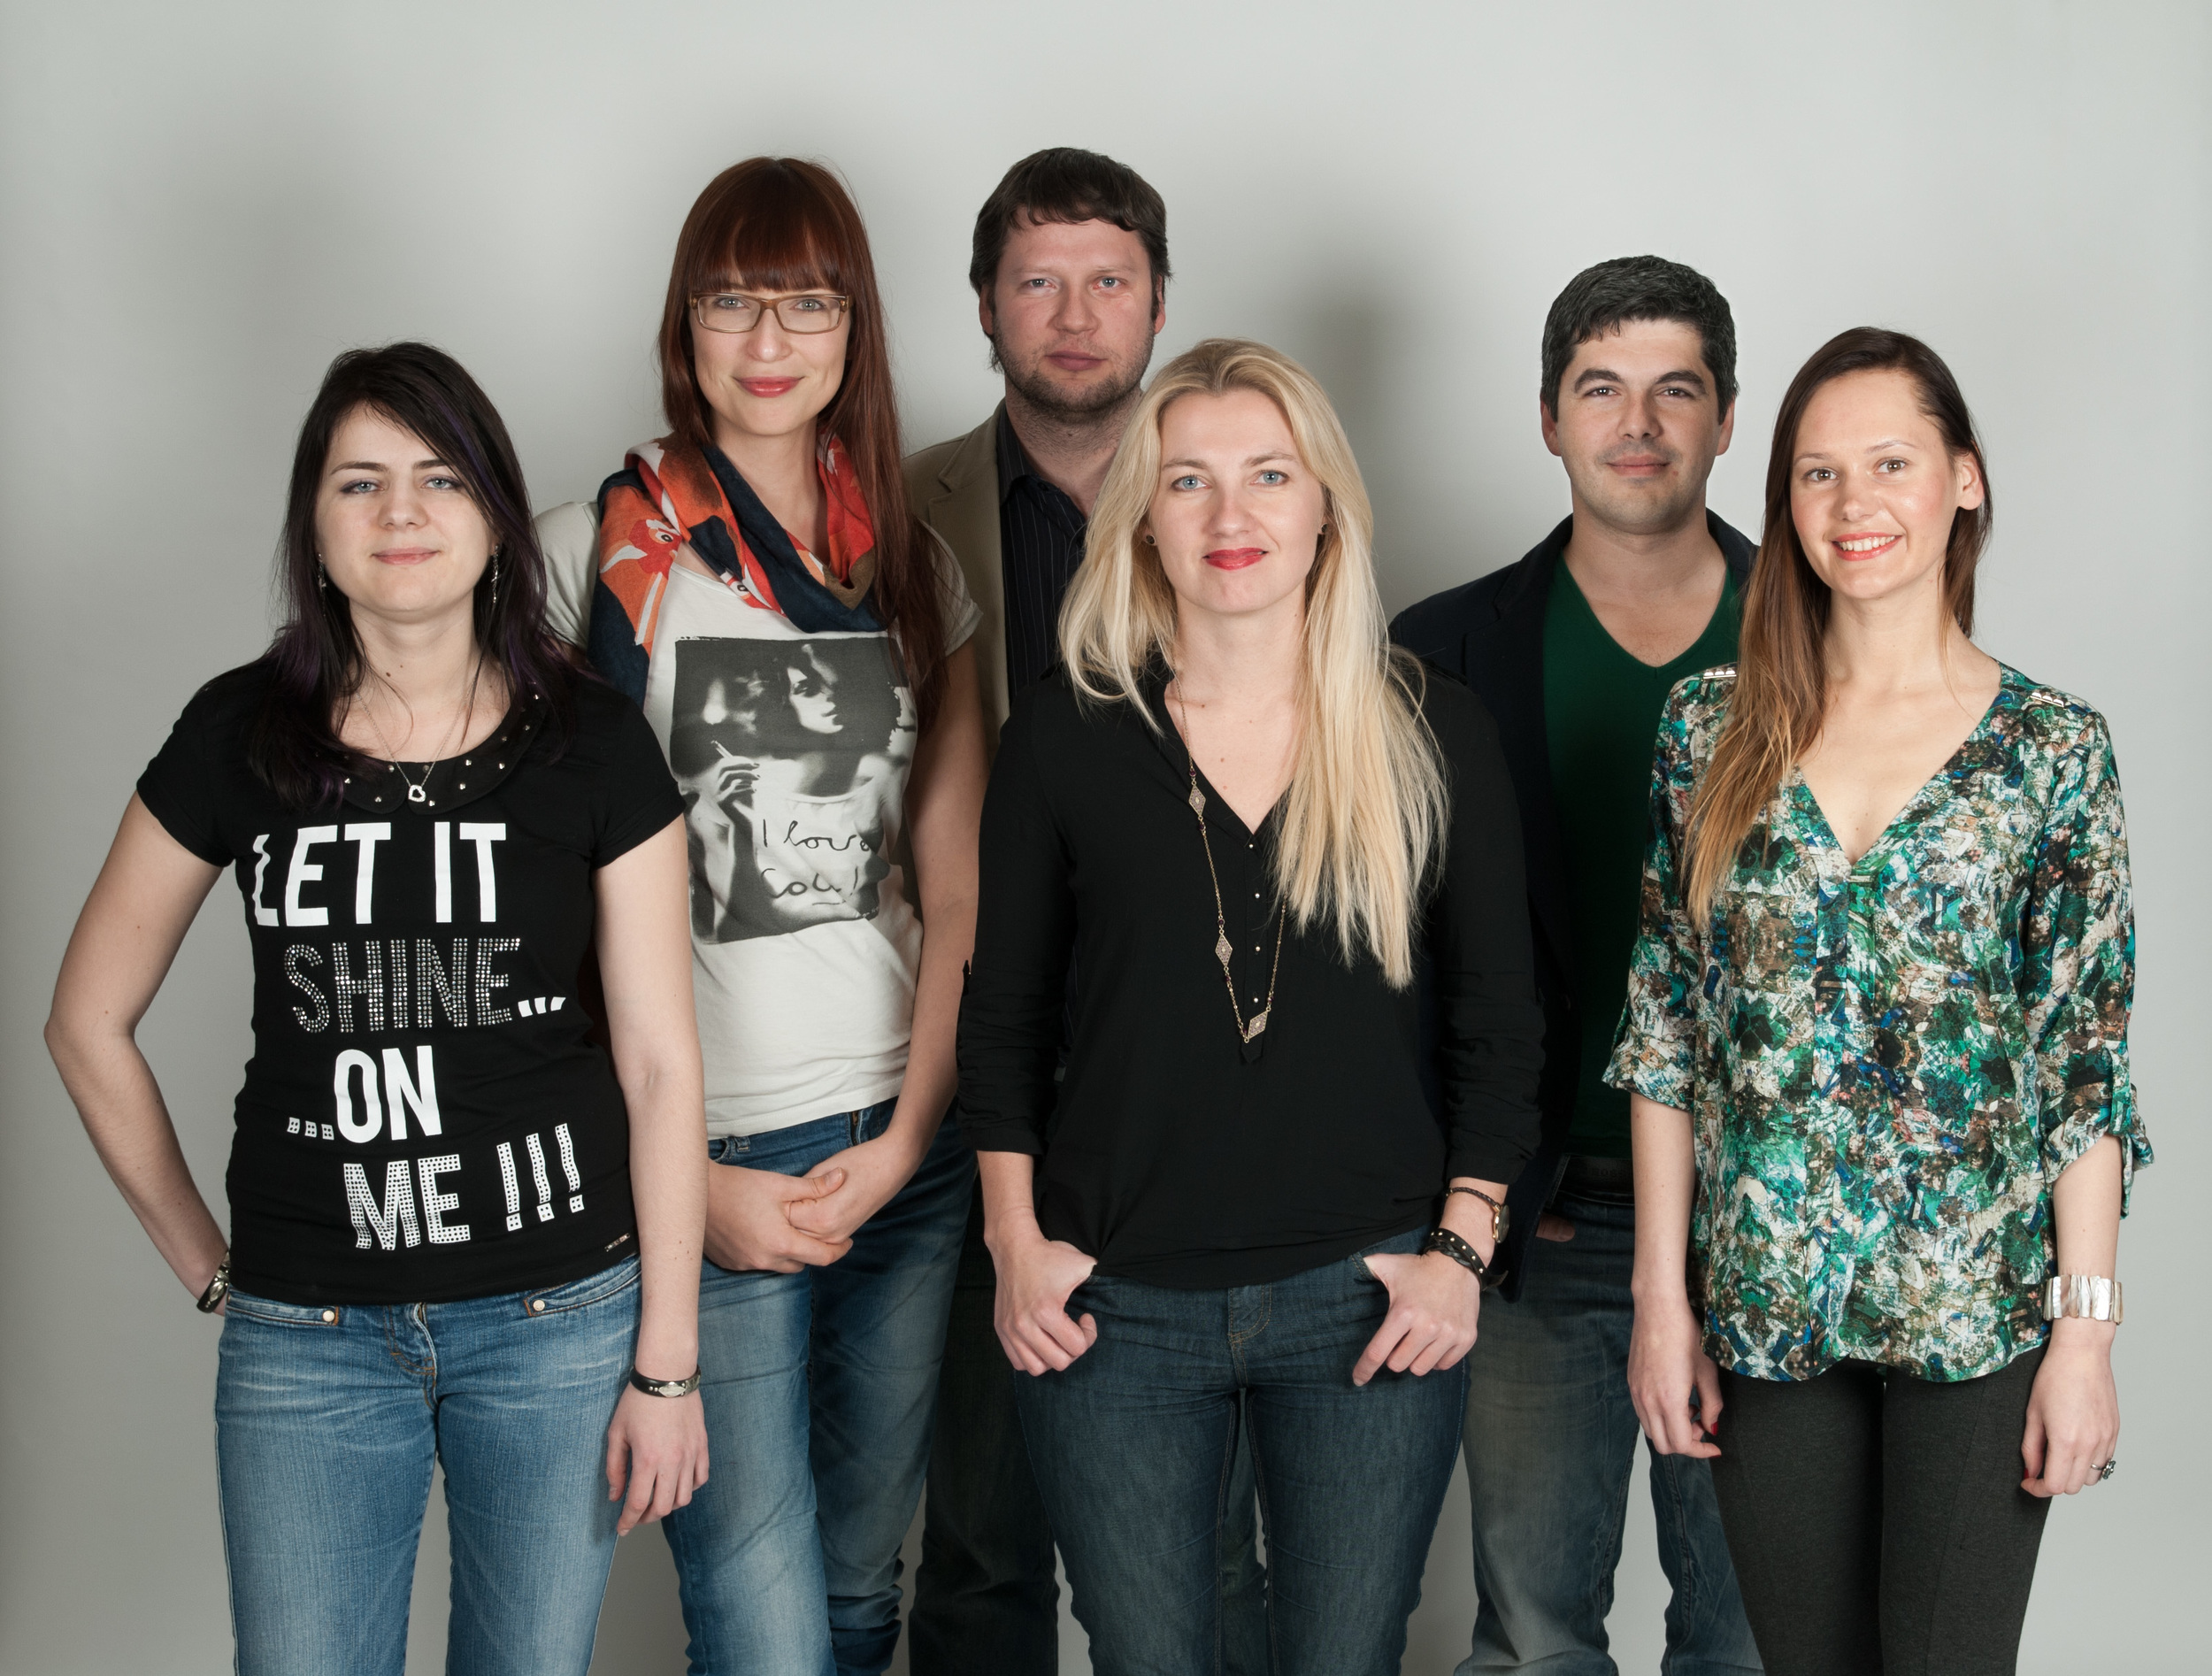 The GoWorkABit.com team